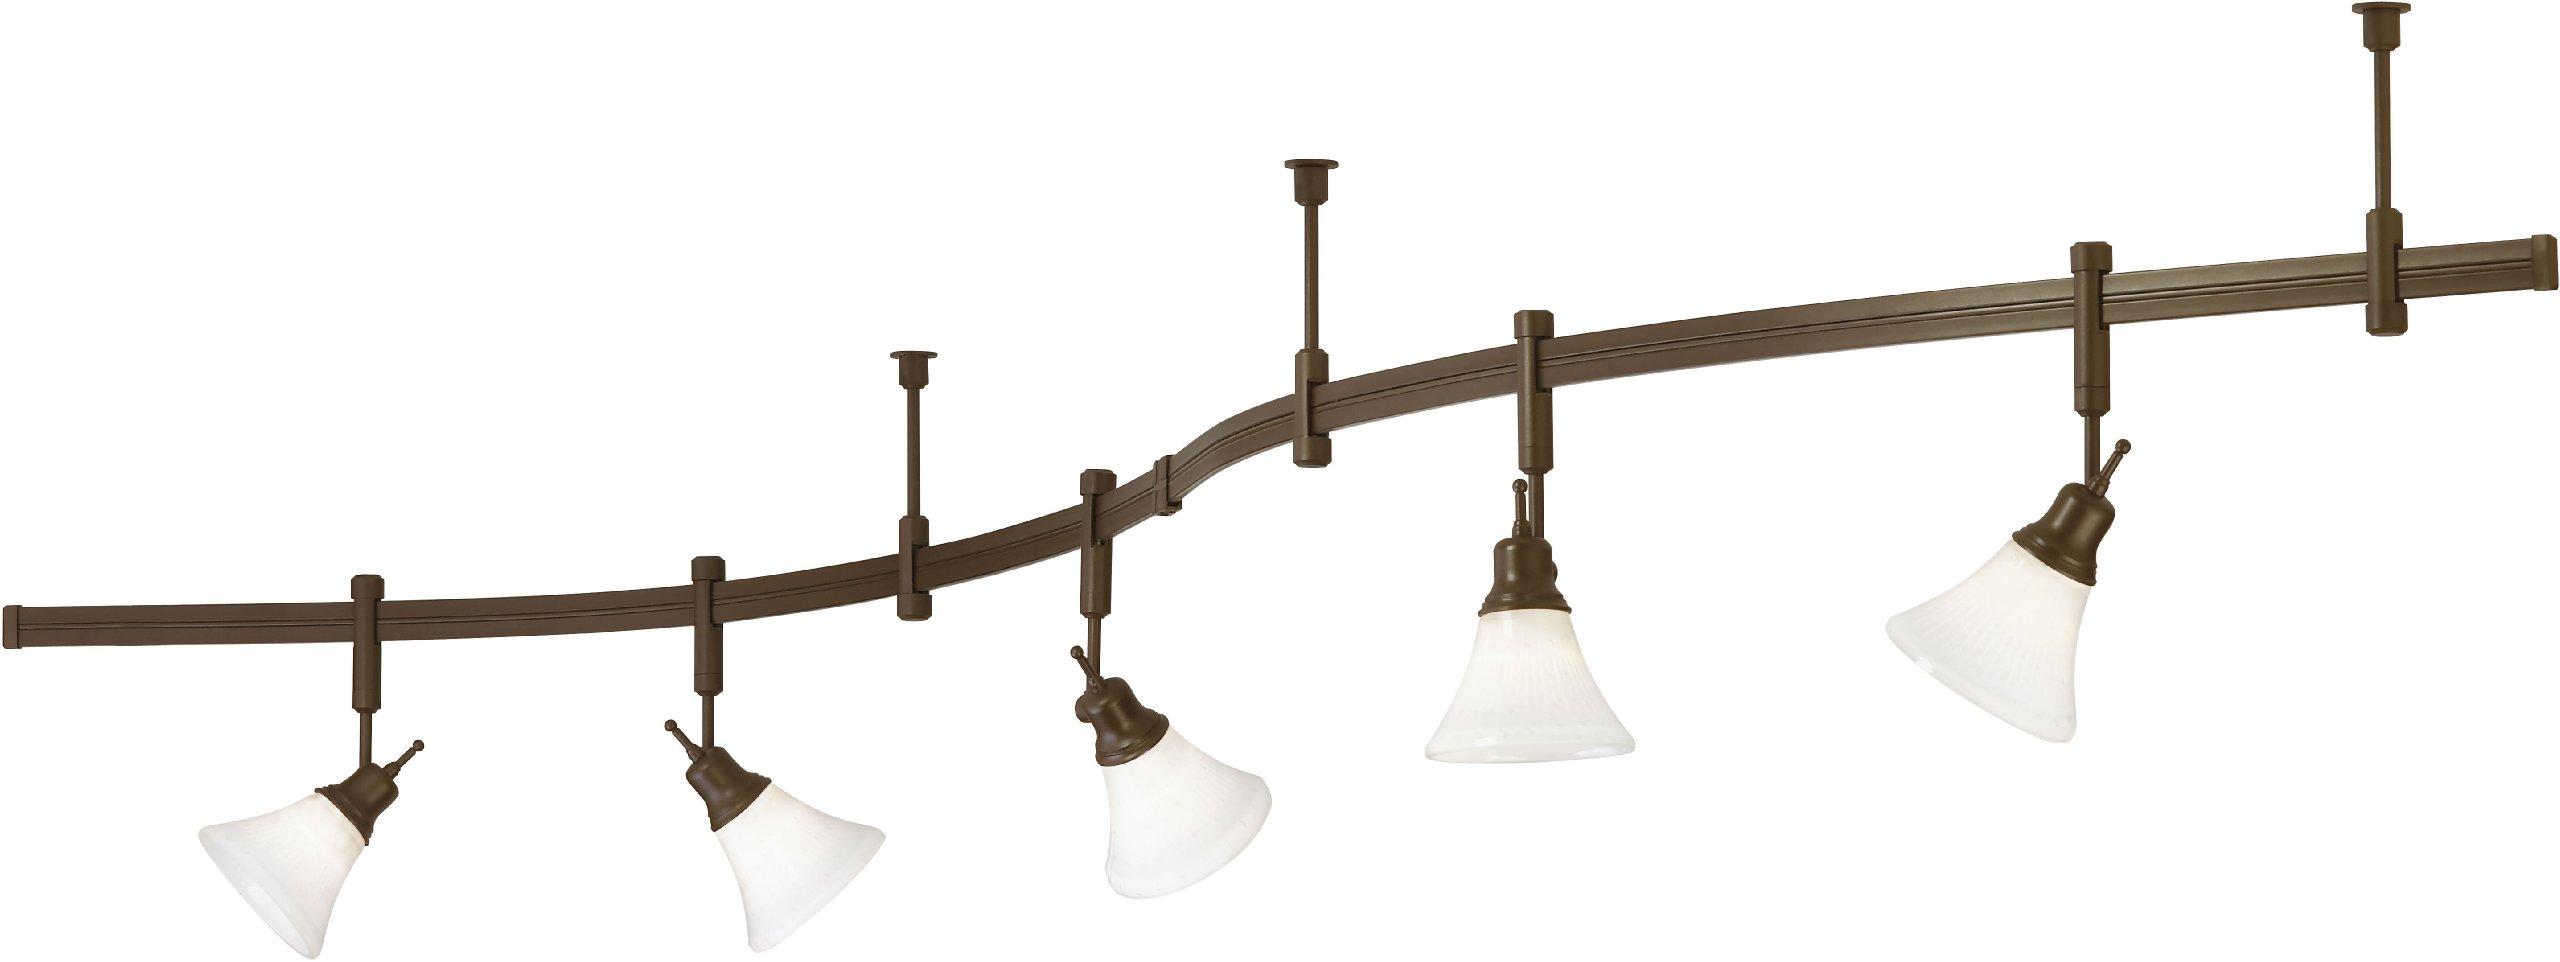 Tiella 800RAL5CWZ, Casual Track Lighting Kits, 100 watt Flexible Track Light System, Bronze